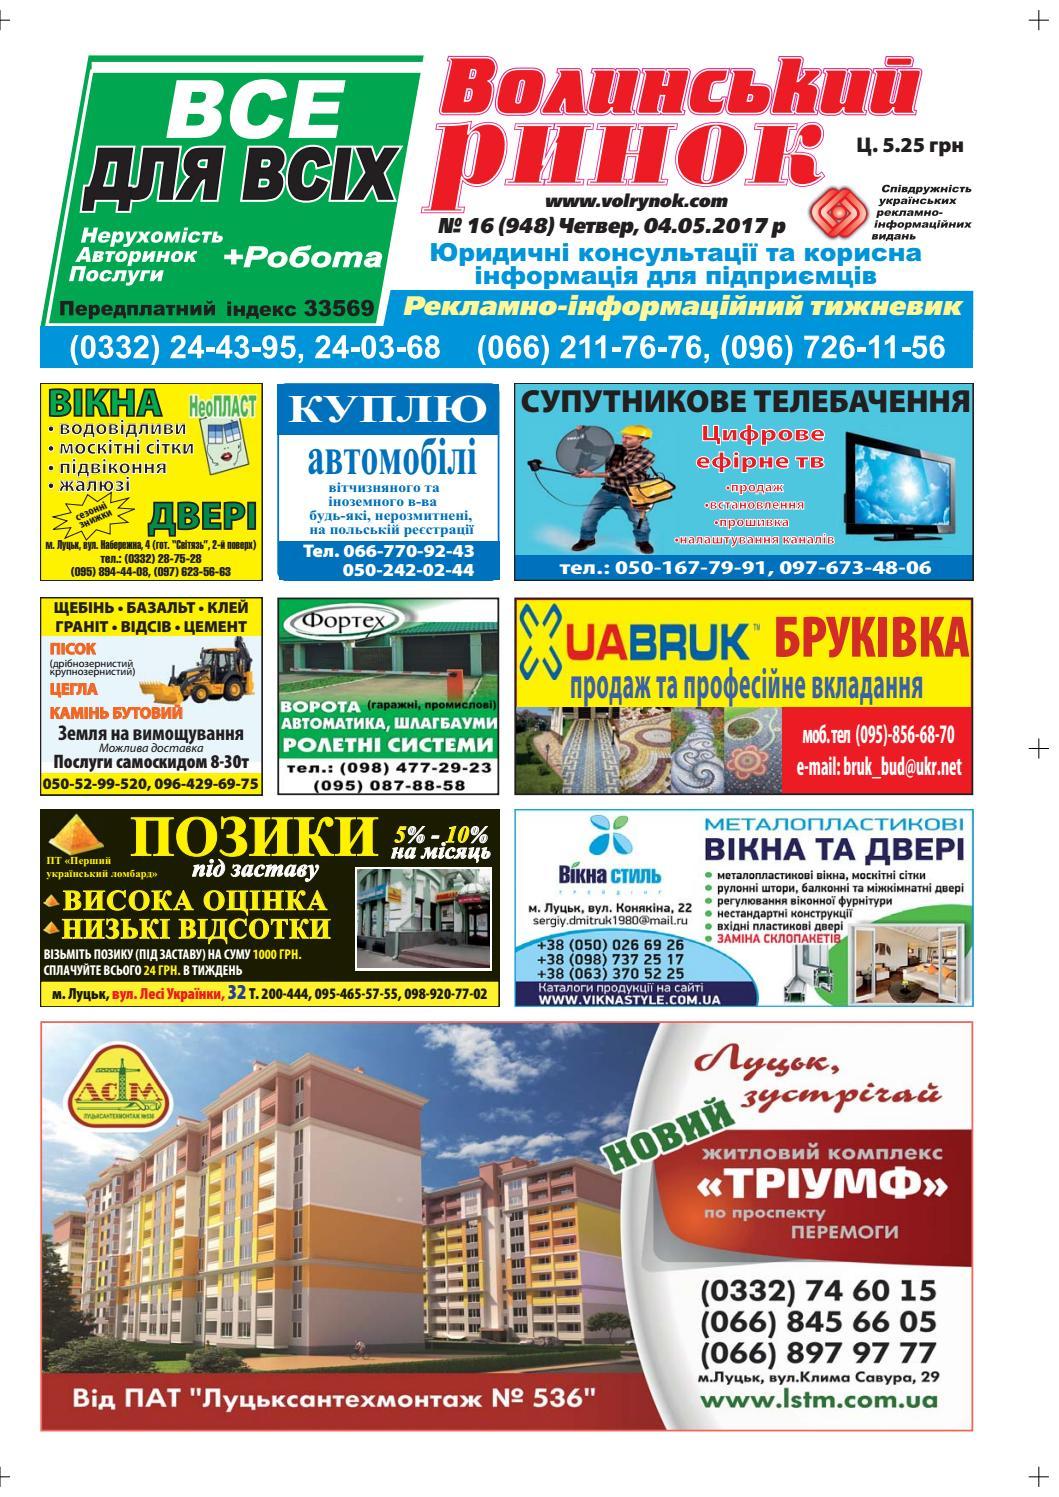 Газета №16 04. 05. 2017 by volrynok - issuu 3ac1ede89d0a7